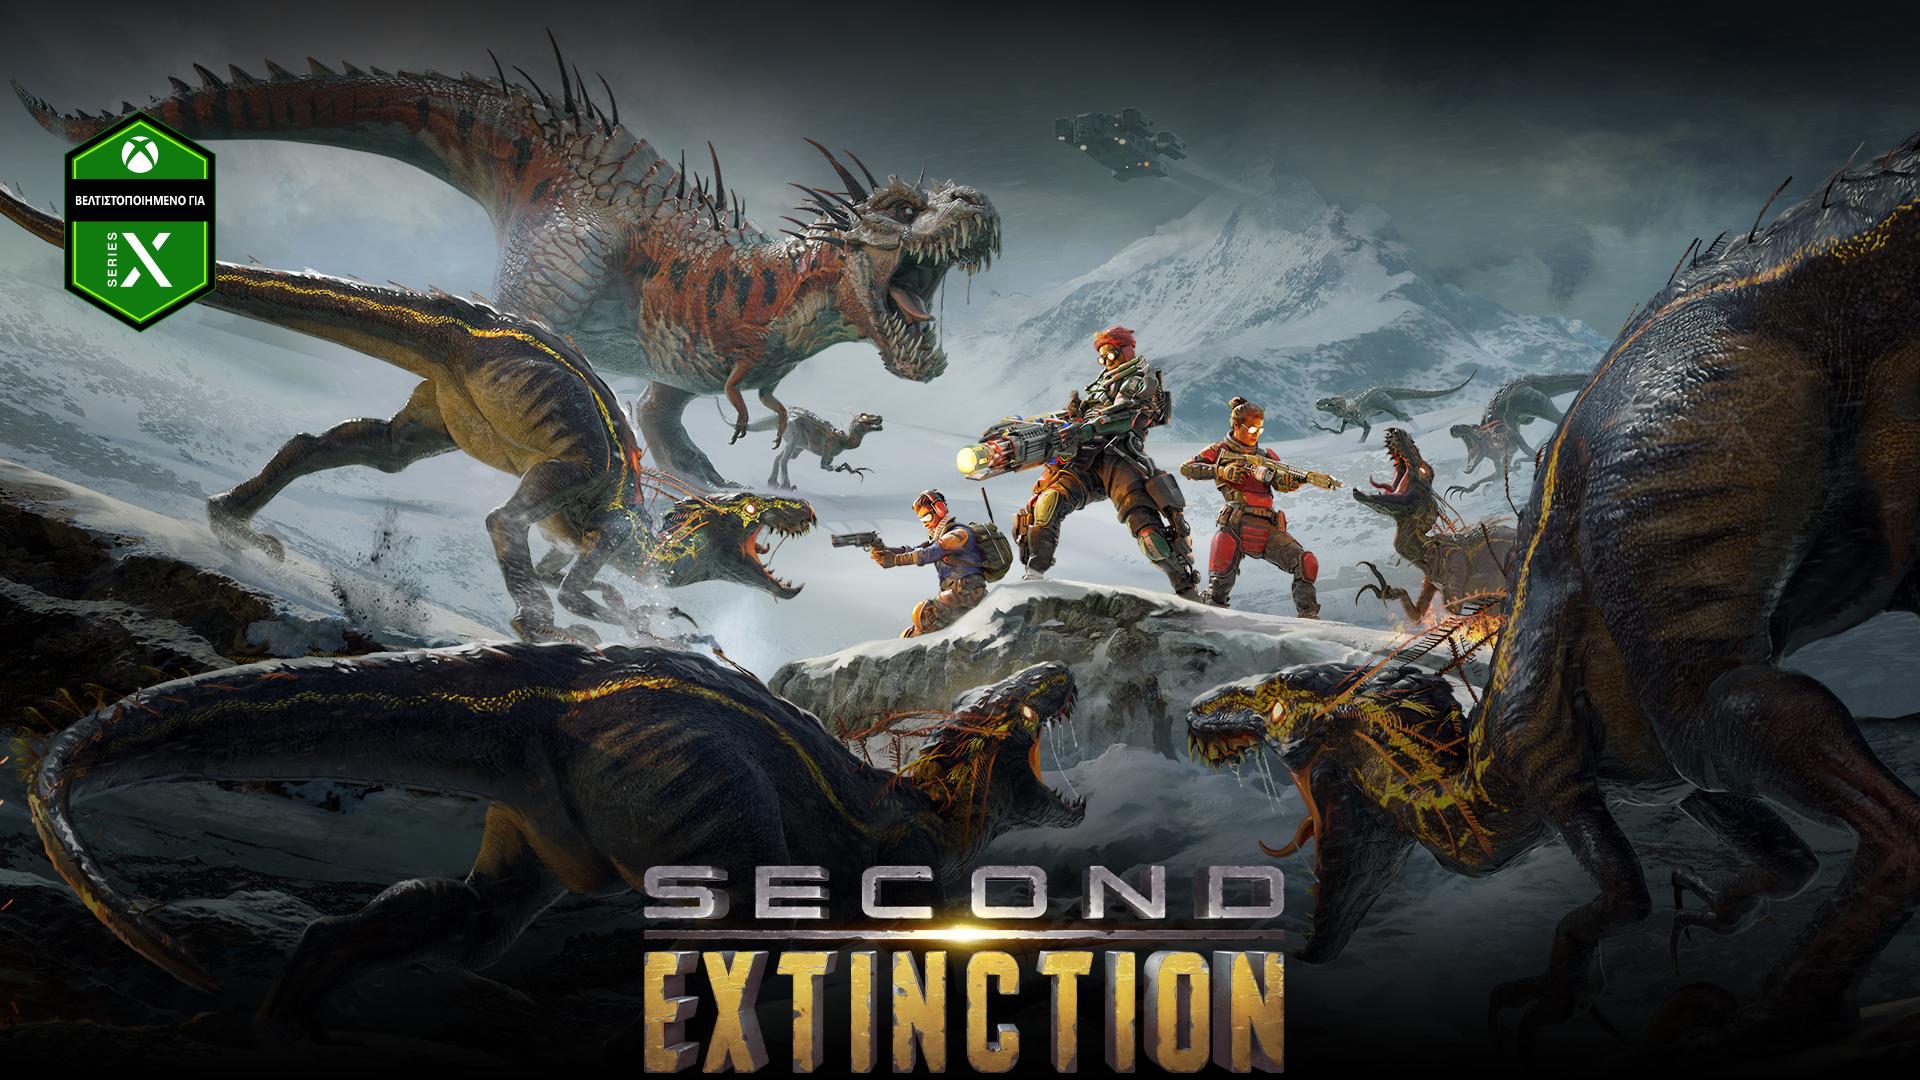 Second Extinction, Βελτιστοποιημένο για Series X, μια ομάδα χαρακτήρων συγκρούεται με μια ομάδα δεινοσαύρων.